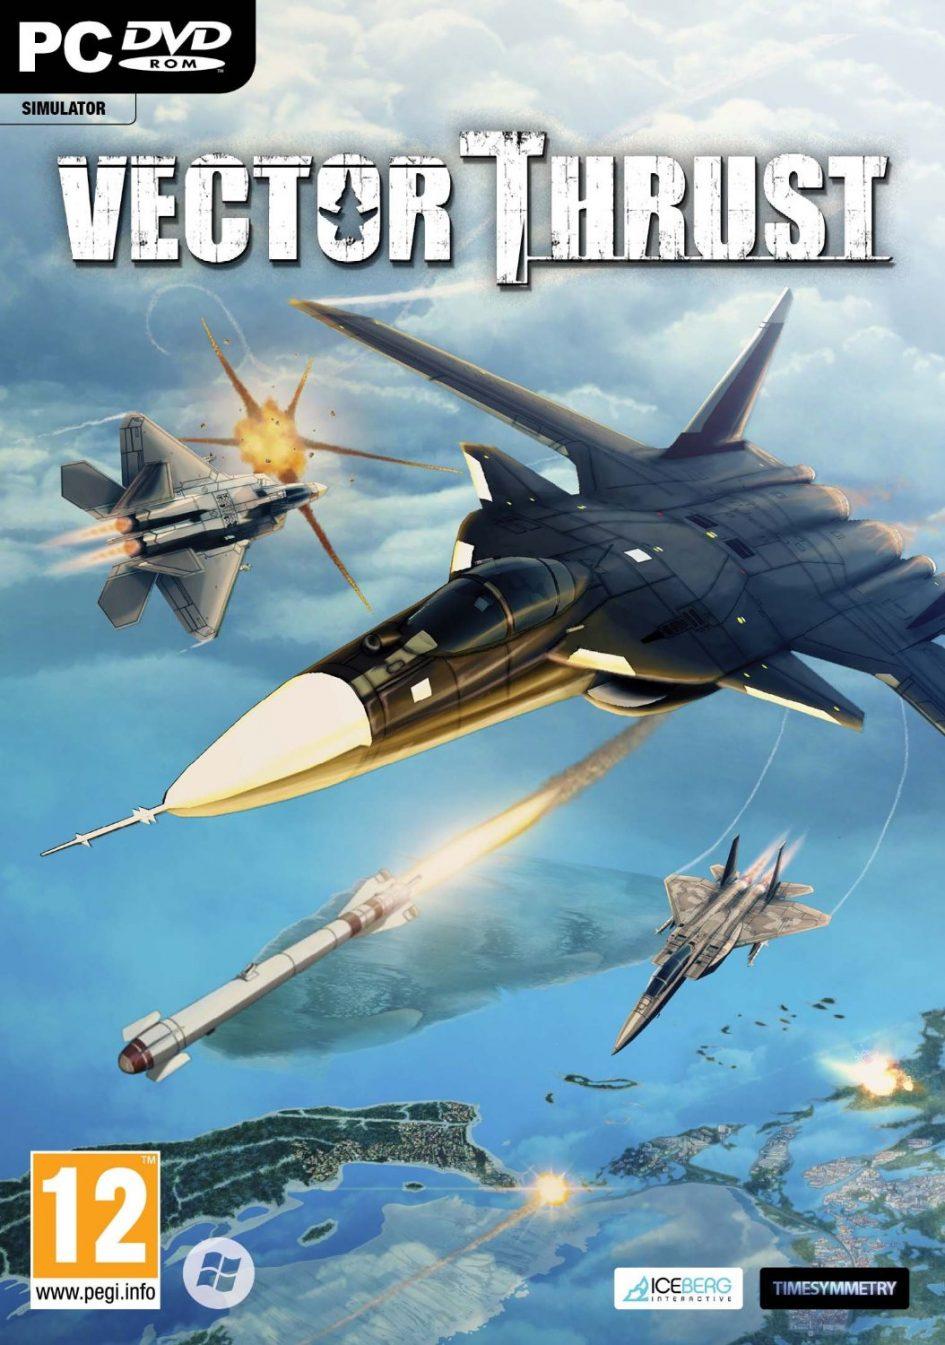 Vector Thrust Free Download Full Version PC Game Setup